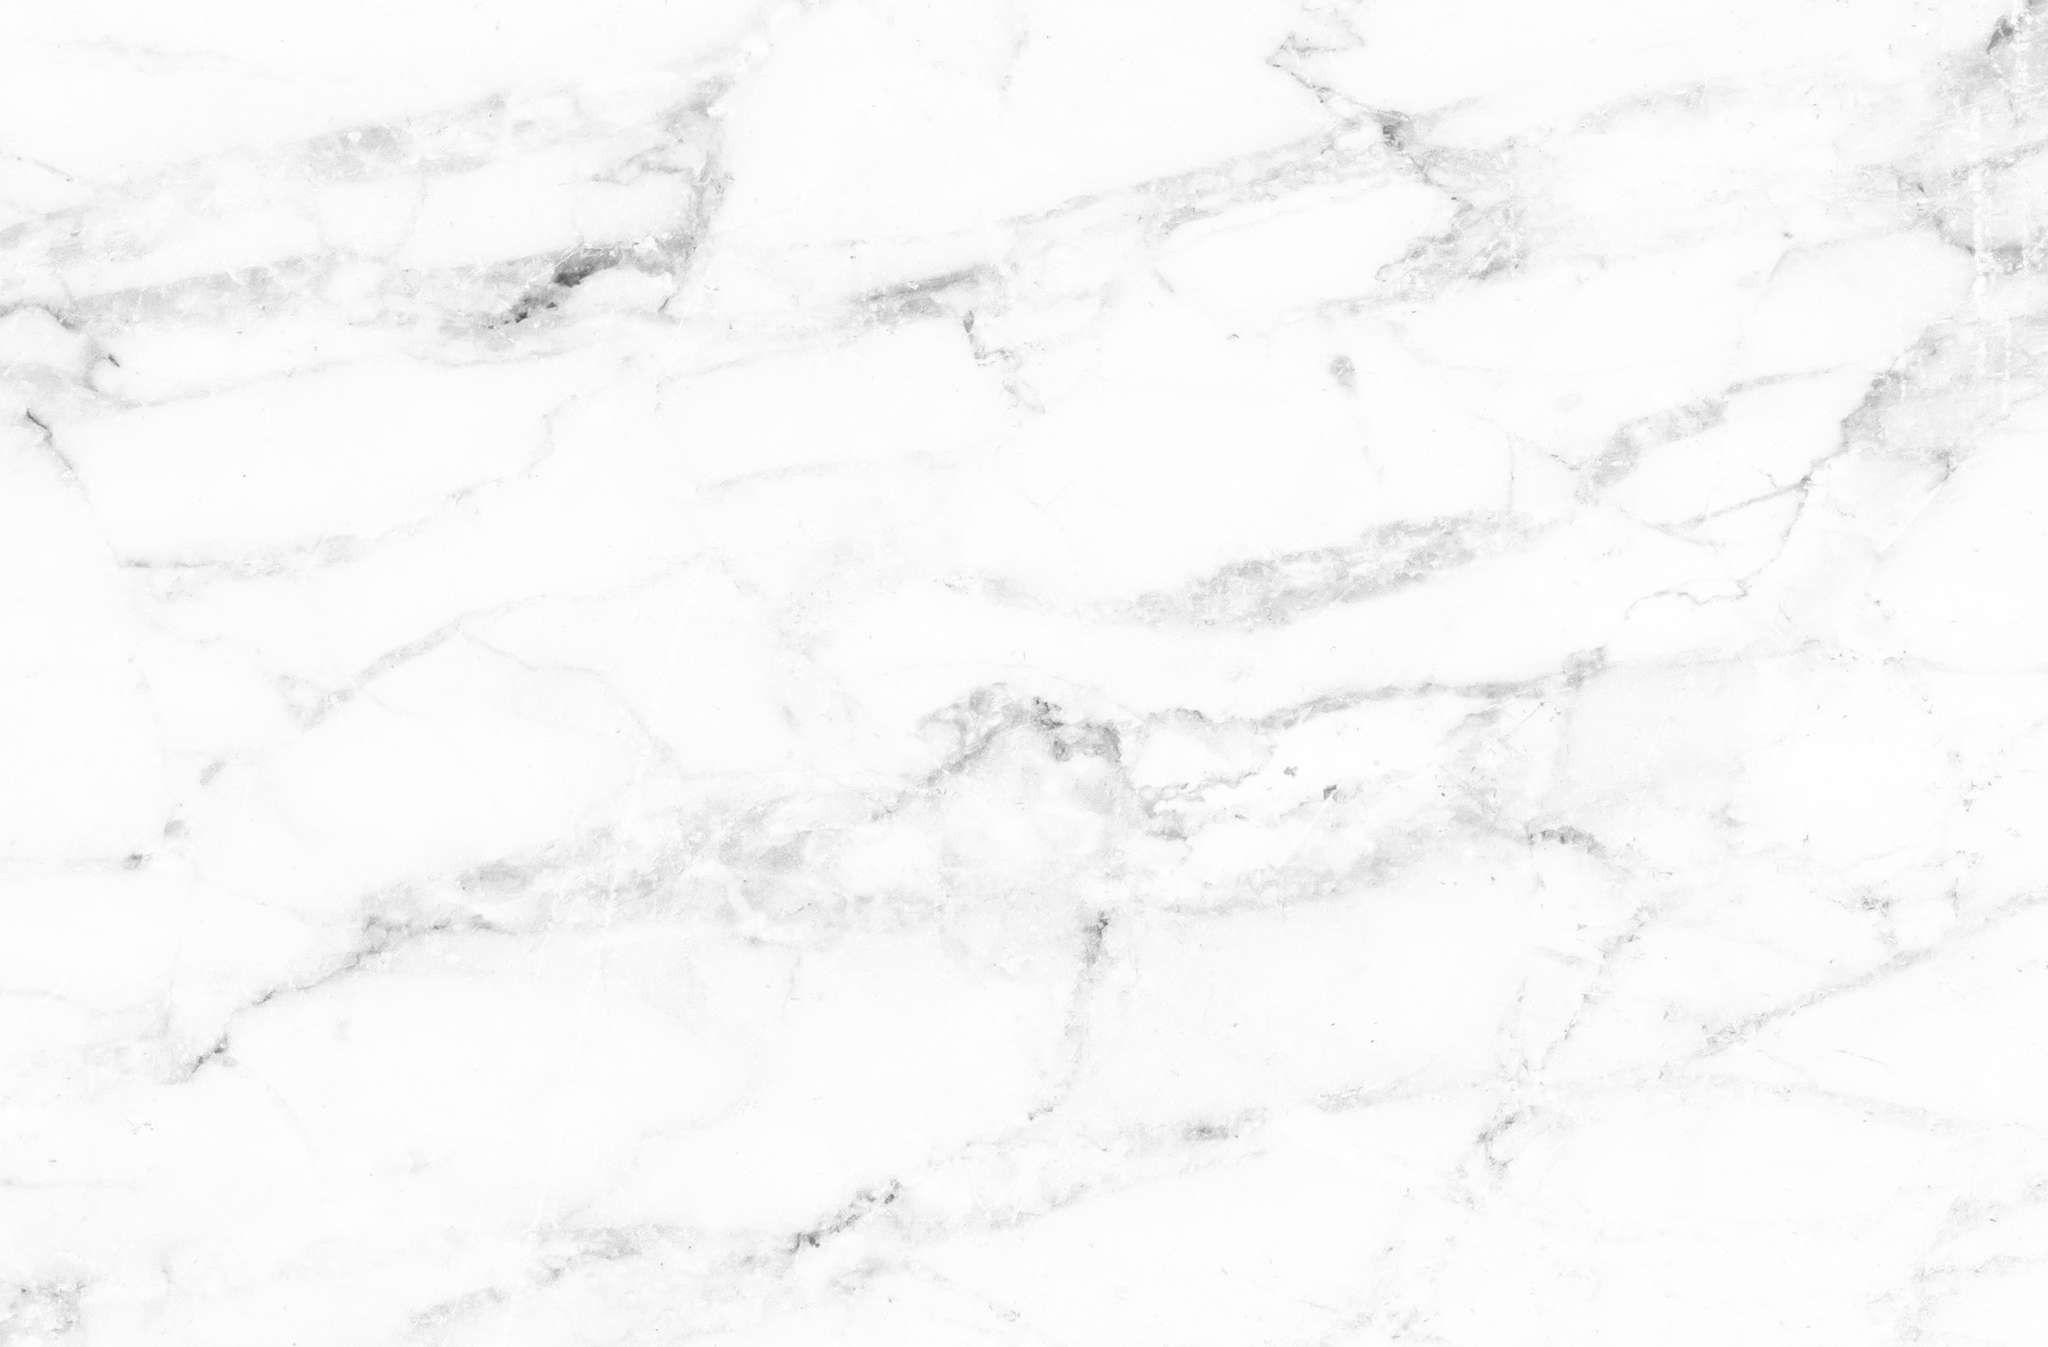 Its A League Marble Desktop Wallpaper Aesthetic Desktop Wallpaper Macbook Air Wallpaper